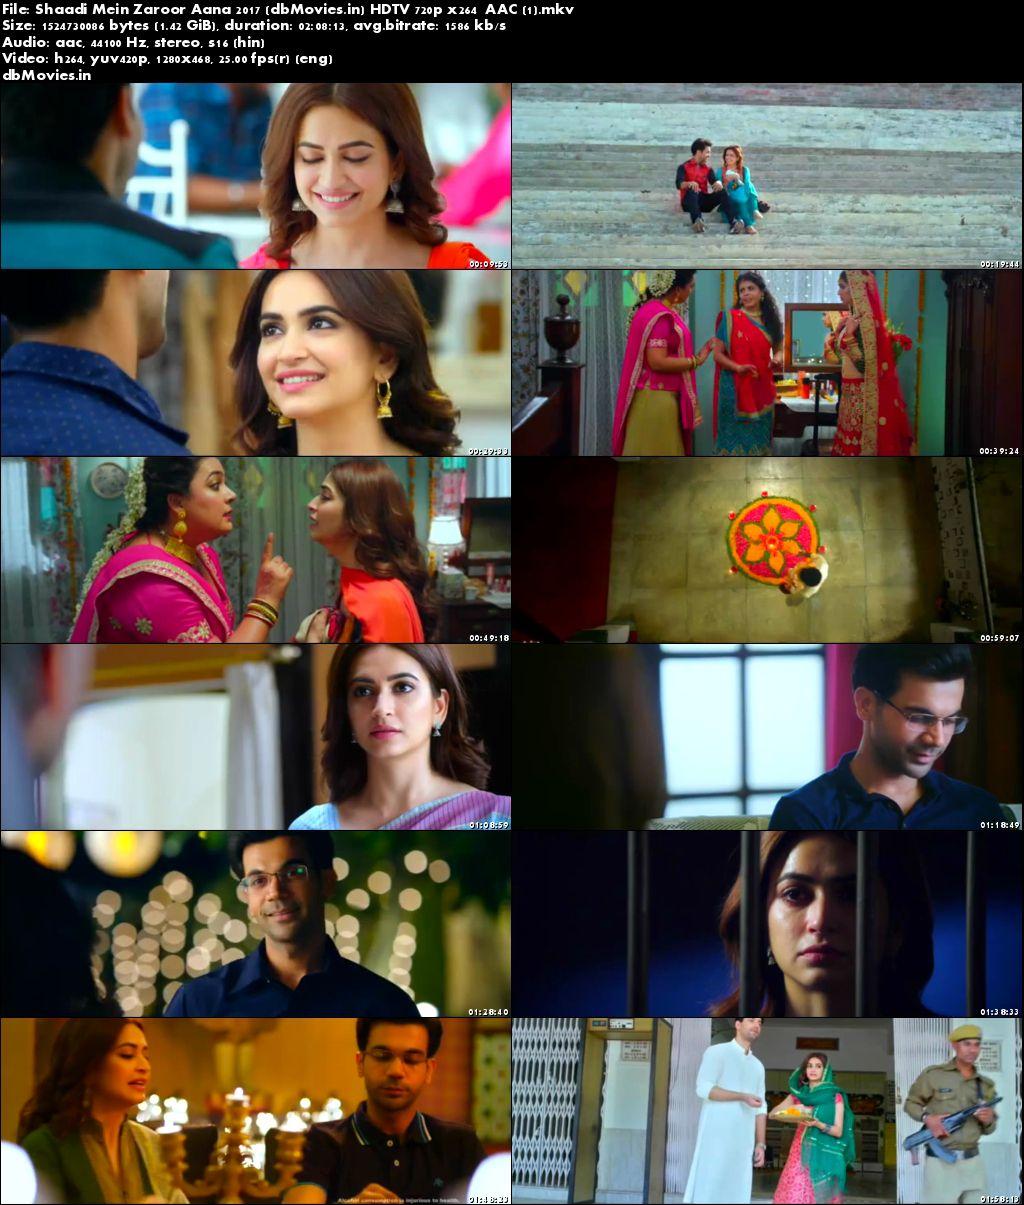 screen shot Shaadi Mein Zaroor Aana 2017 Full Movie Download Hindi 720p